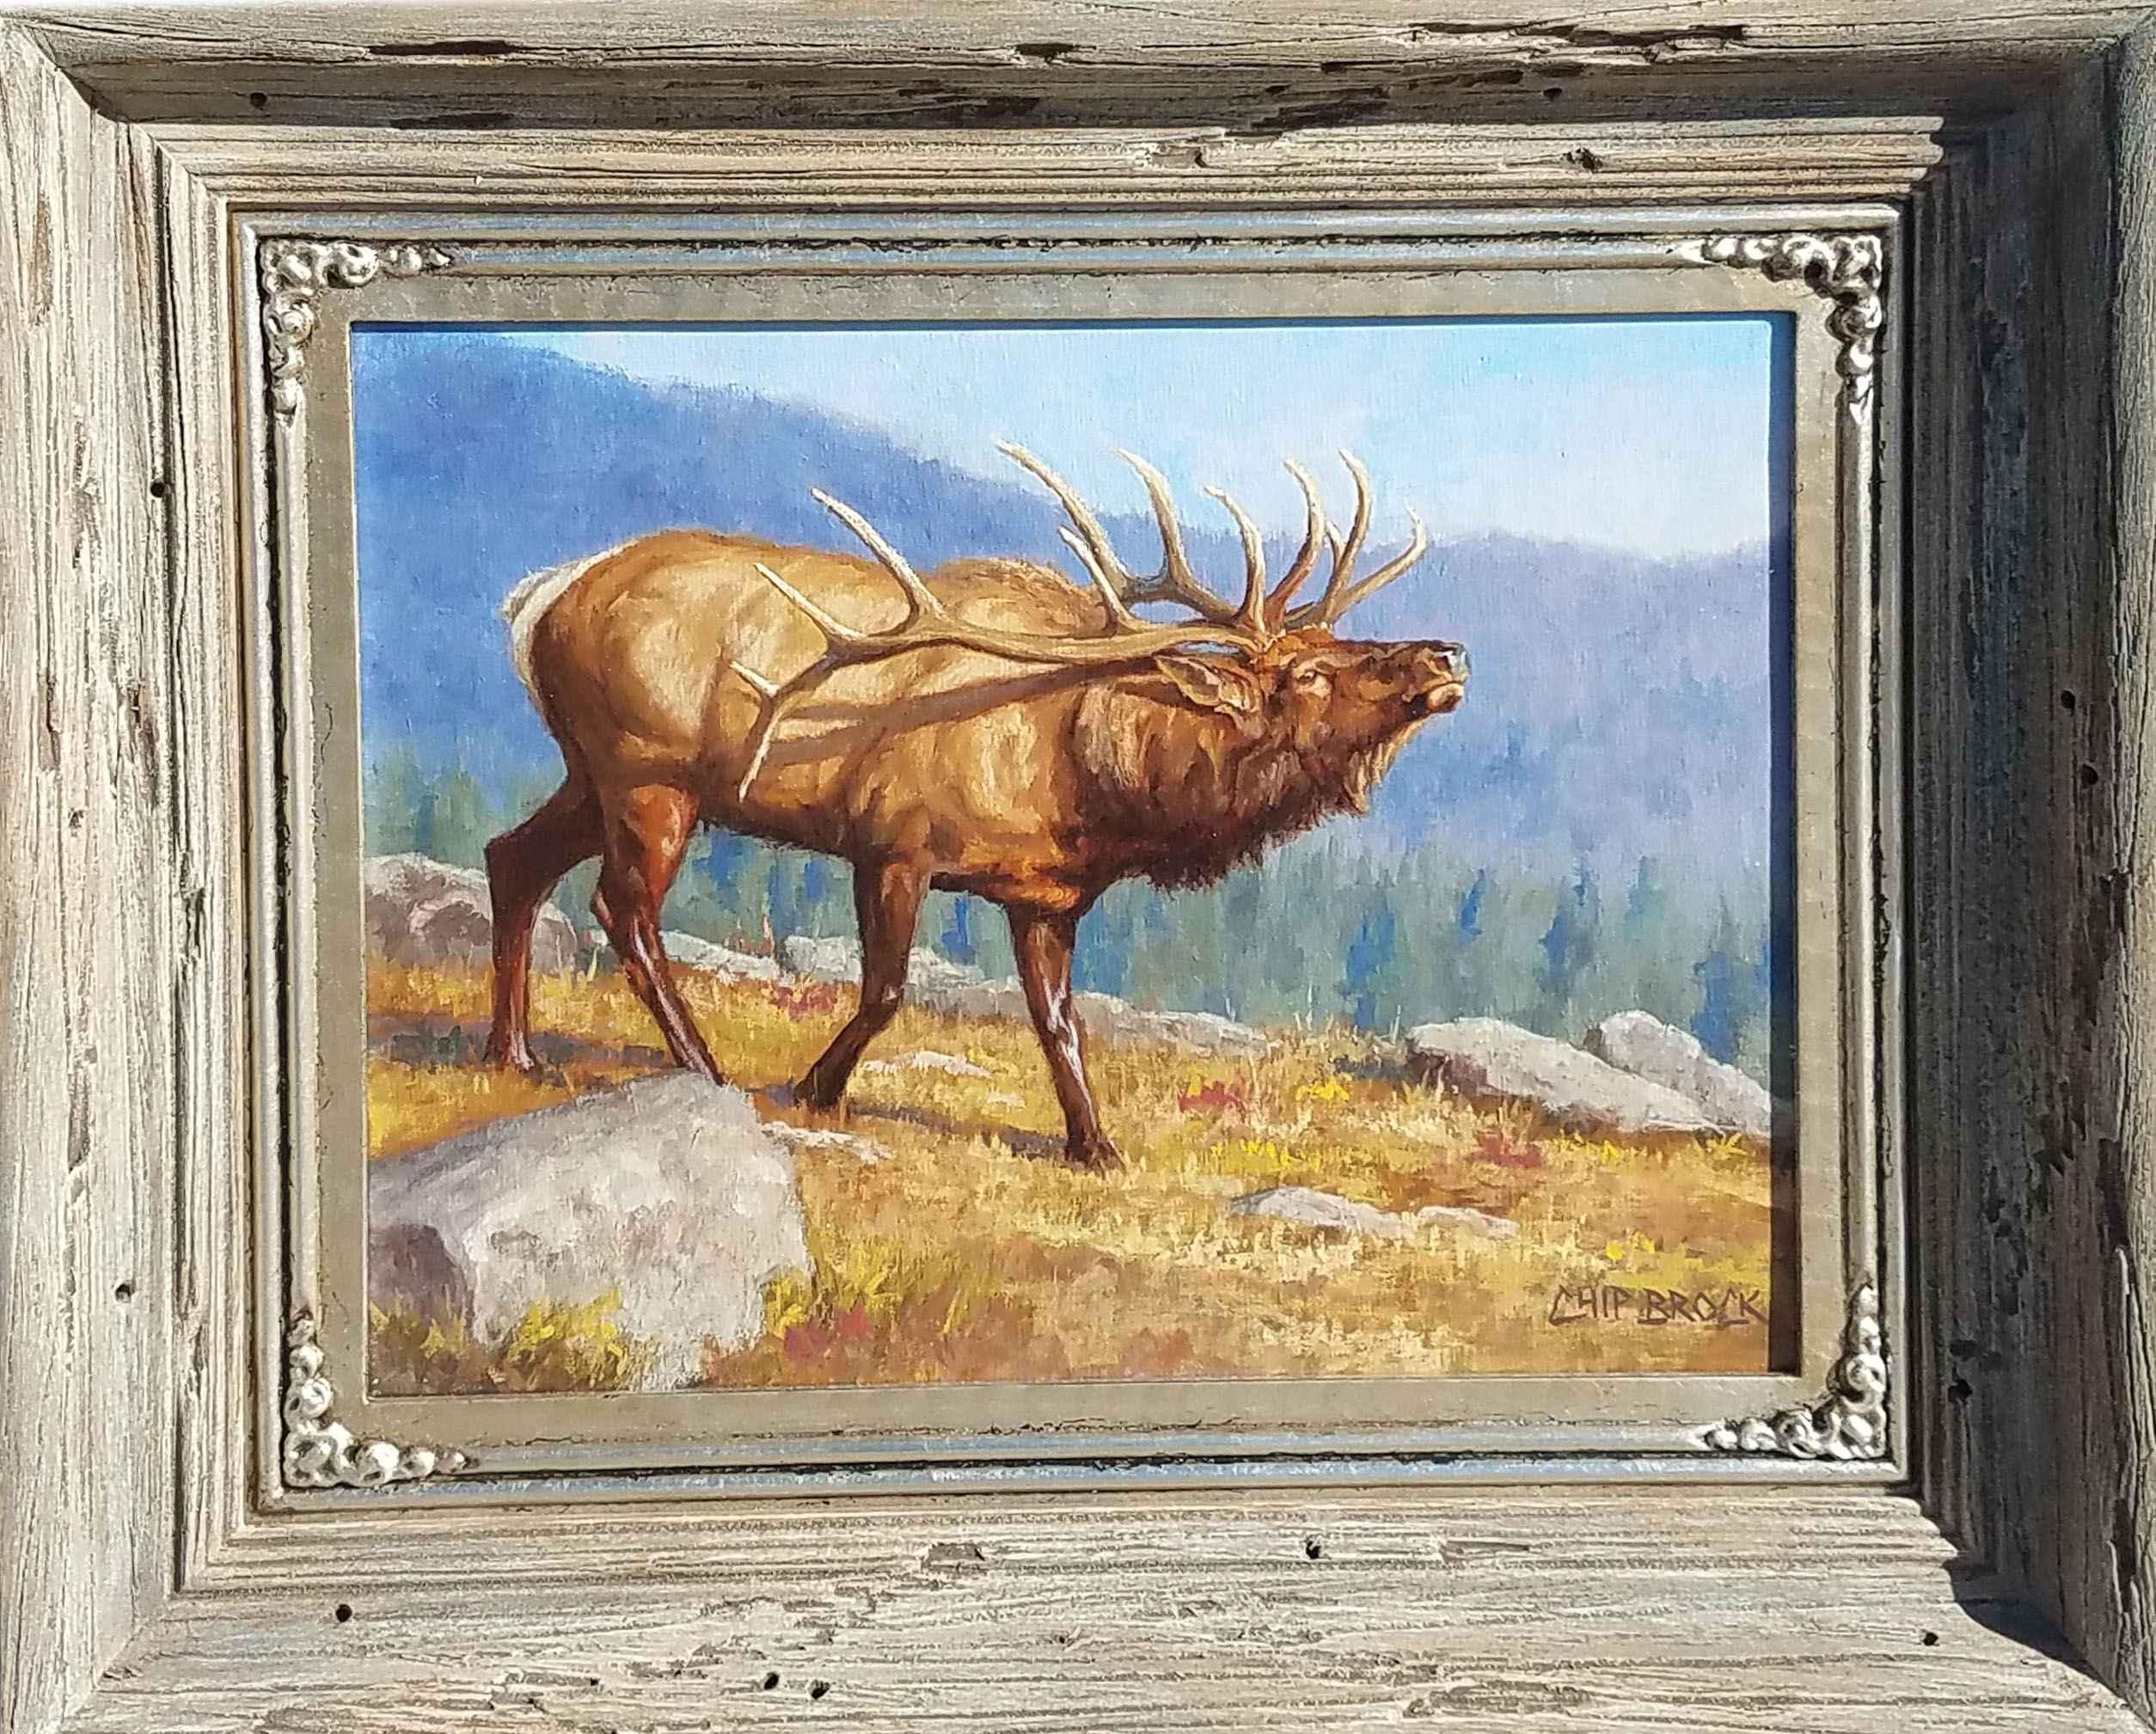 The Ridge Boss by  Chip Brock - Masterpiece Online